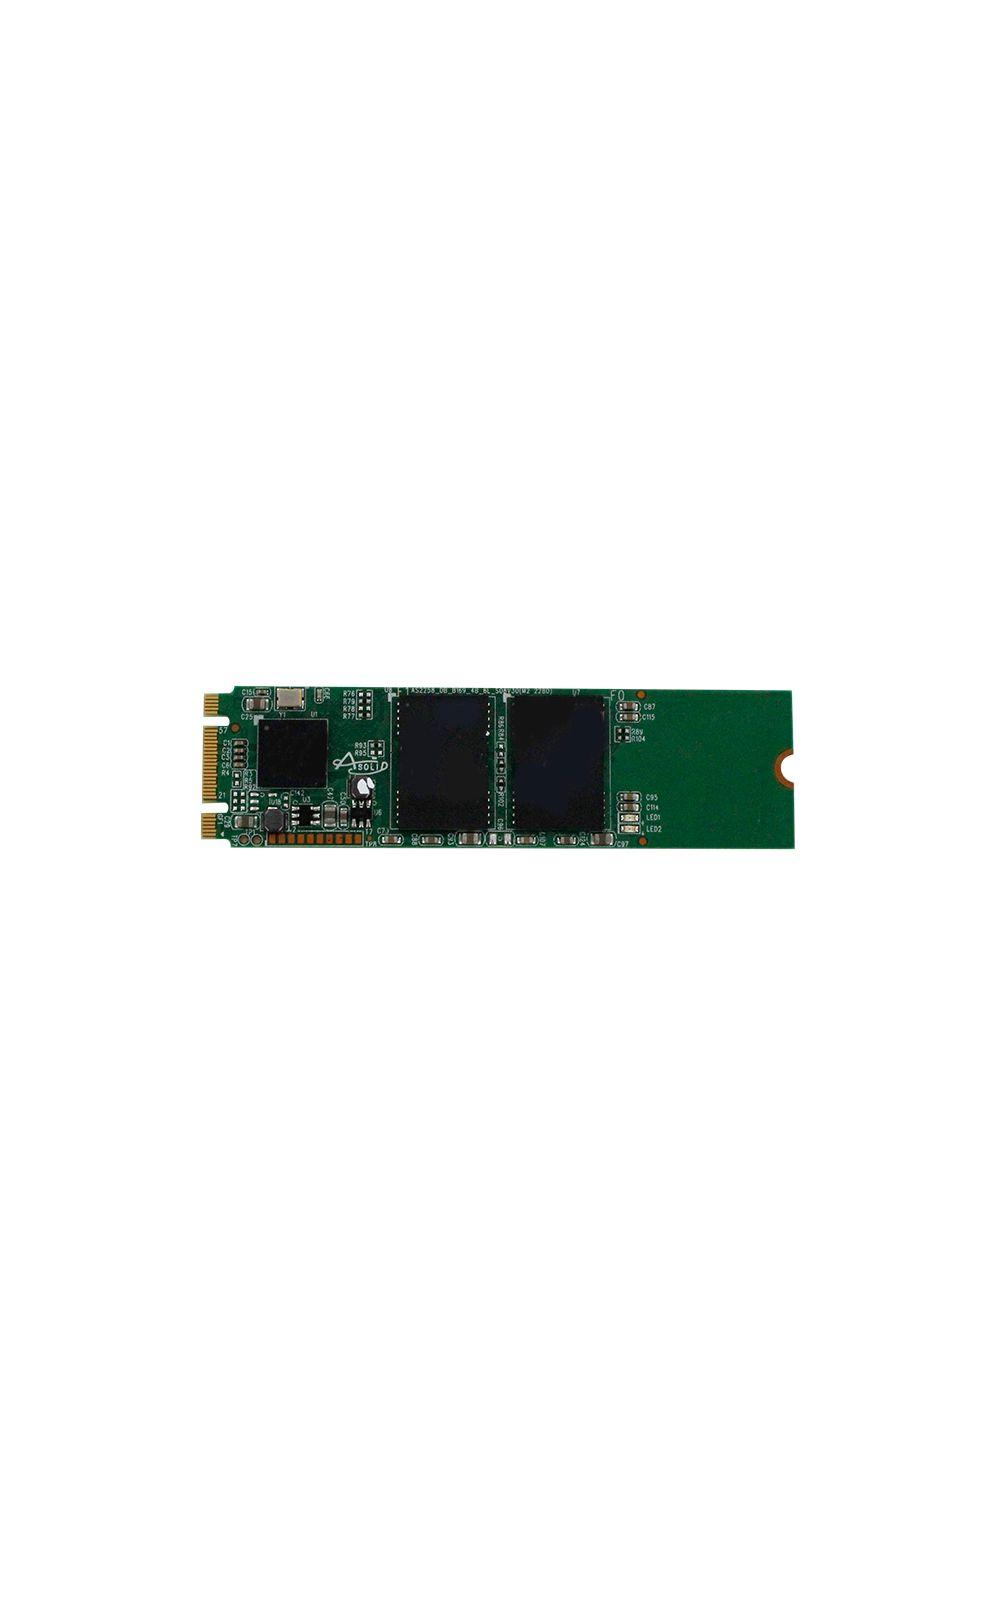 Foto 1 - SSD MULTILASER M.2 2280 (8,0 CM) 120GB AXIS 400 - GRAVAÇÃO 400 MB/S - SS108